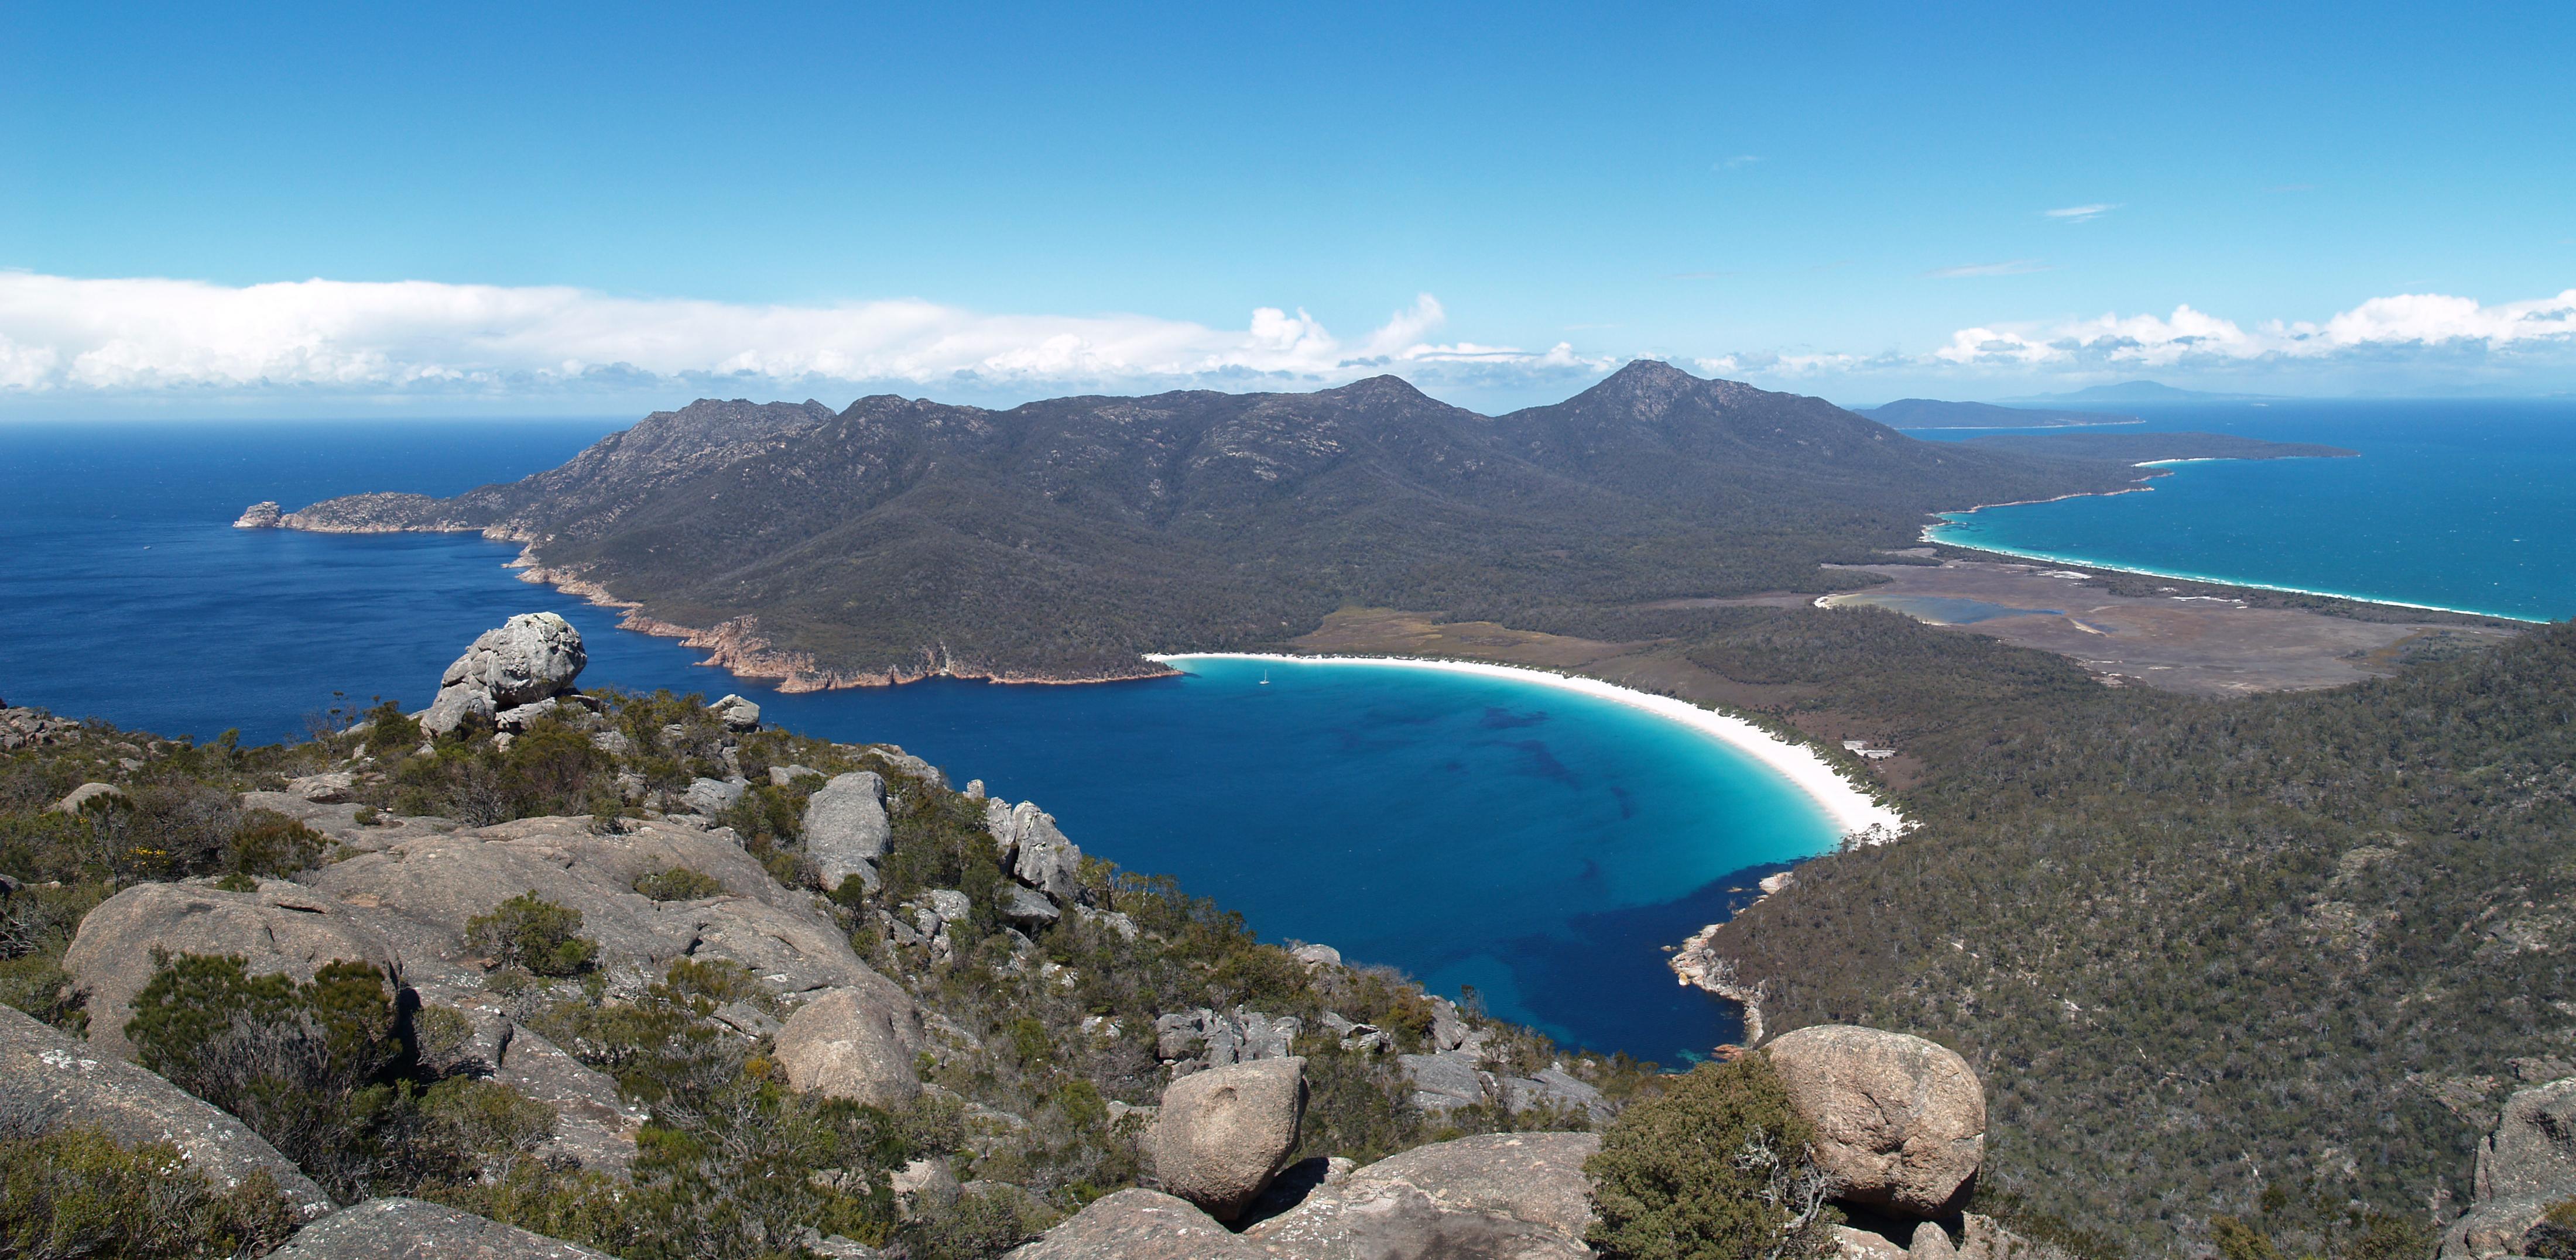 Wineglass Bay, Freycinet Peninsula, south eastern Tasmania. Olympus E500 DSLR.